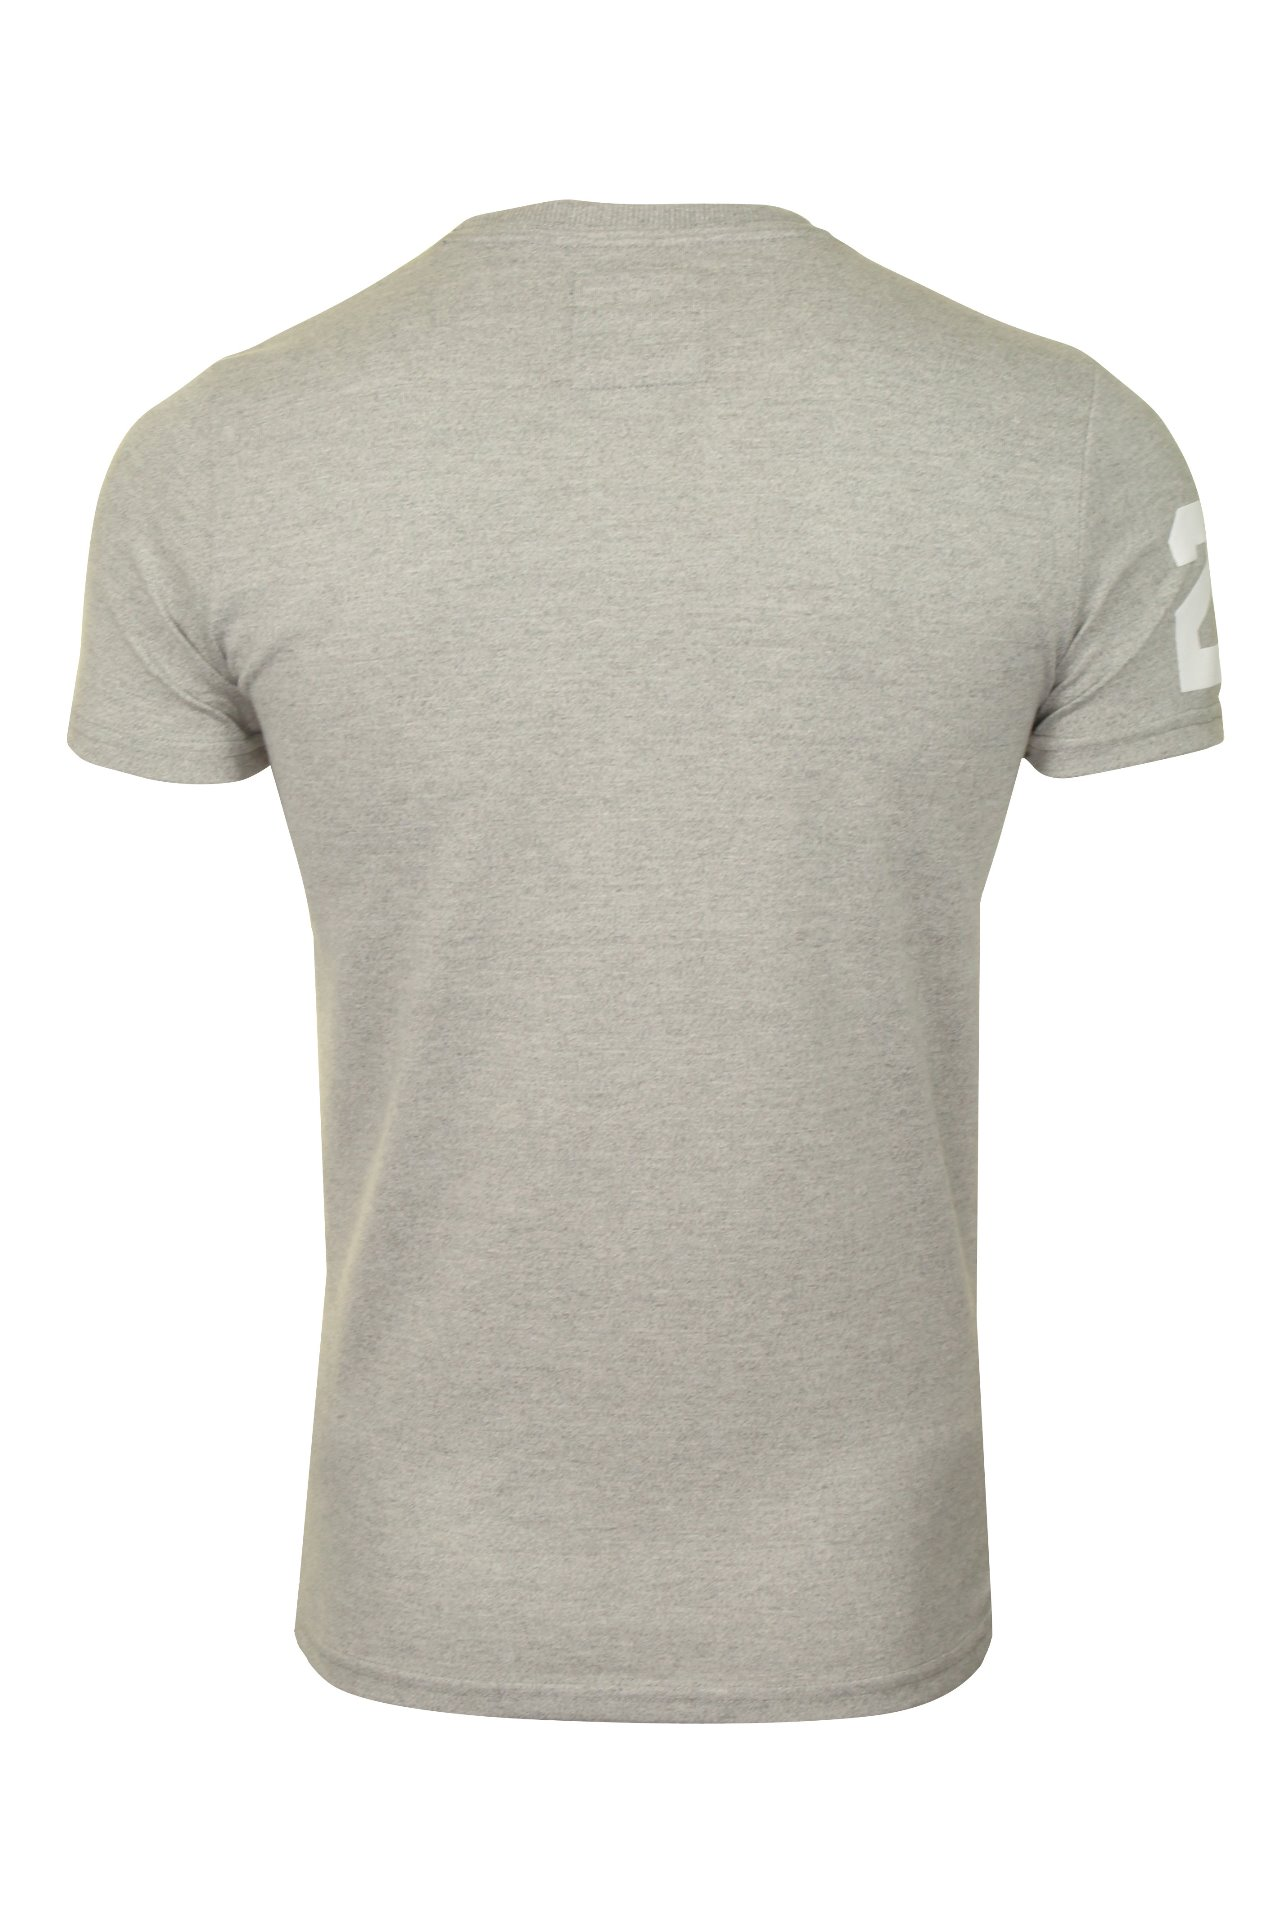 Superdry-Mens-039-Vintage-Logo-039-T-Shirt thumbnail 7